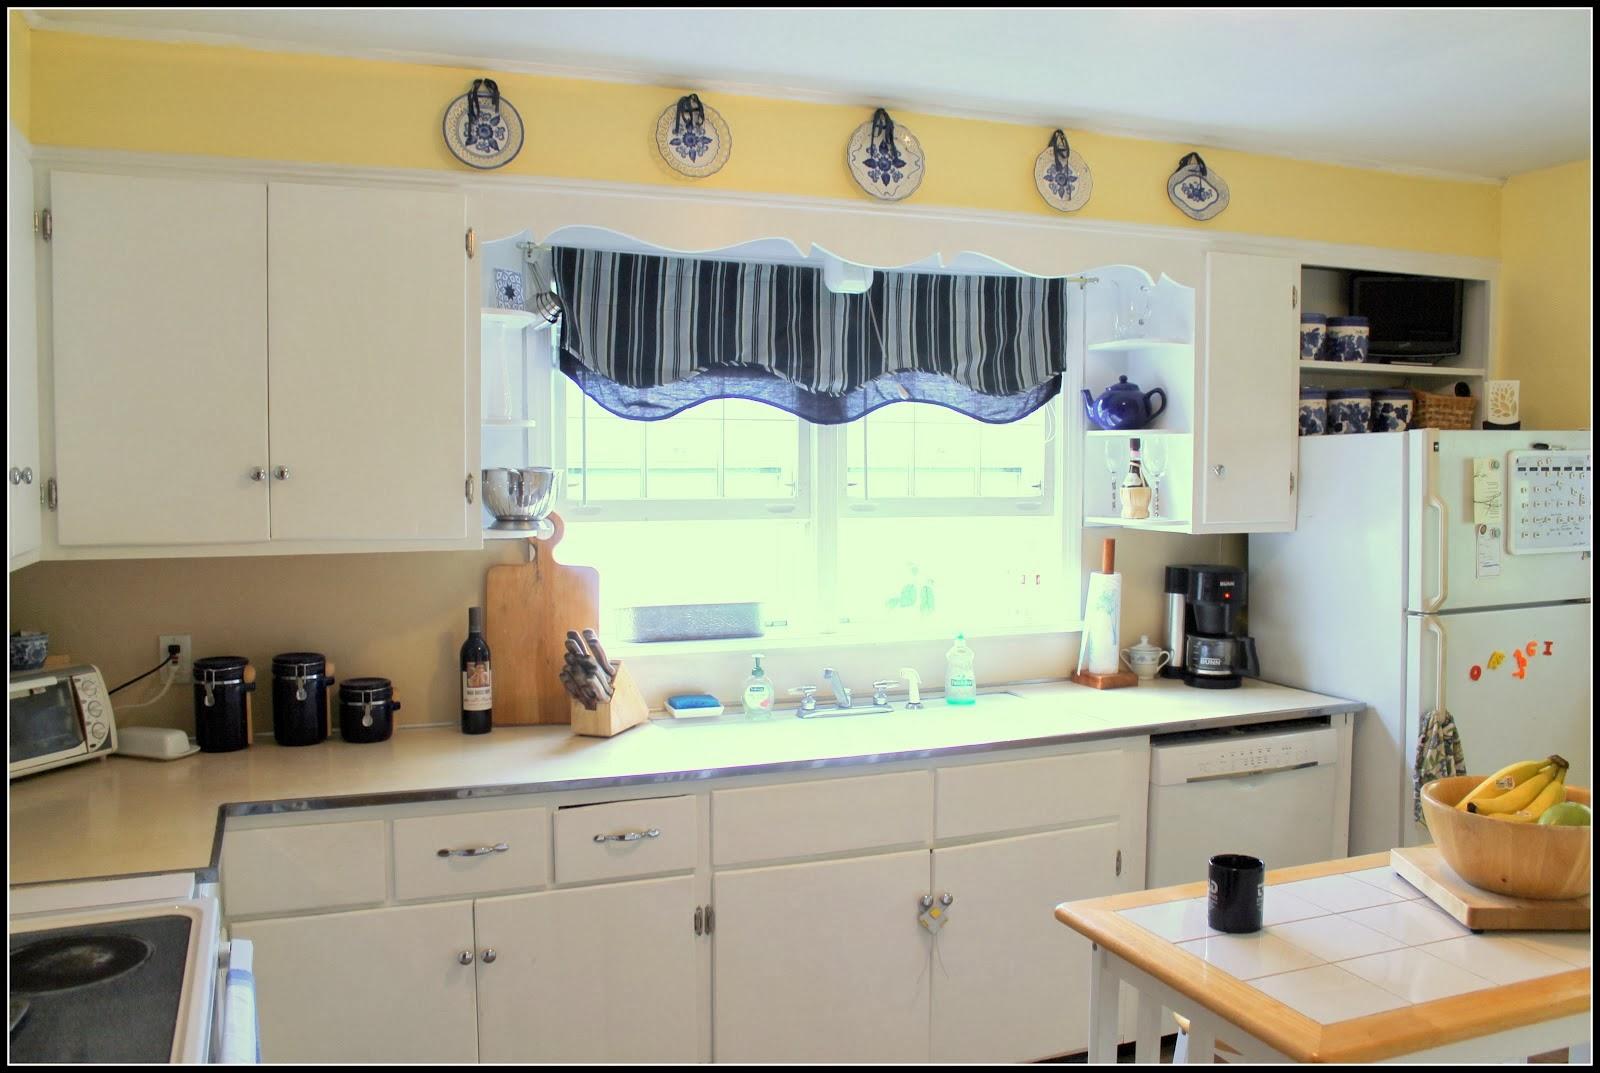 pale blue interior design ideas pale blue walls content base small kitchen island ideas pictures tips hgtv kitchen ideas